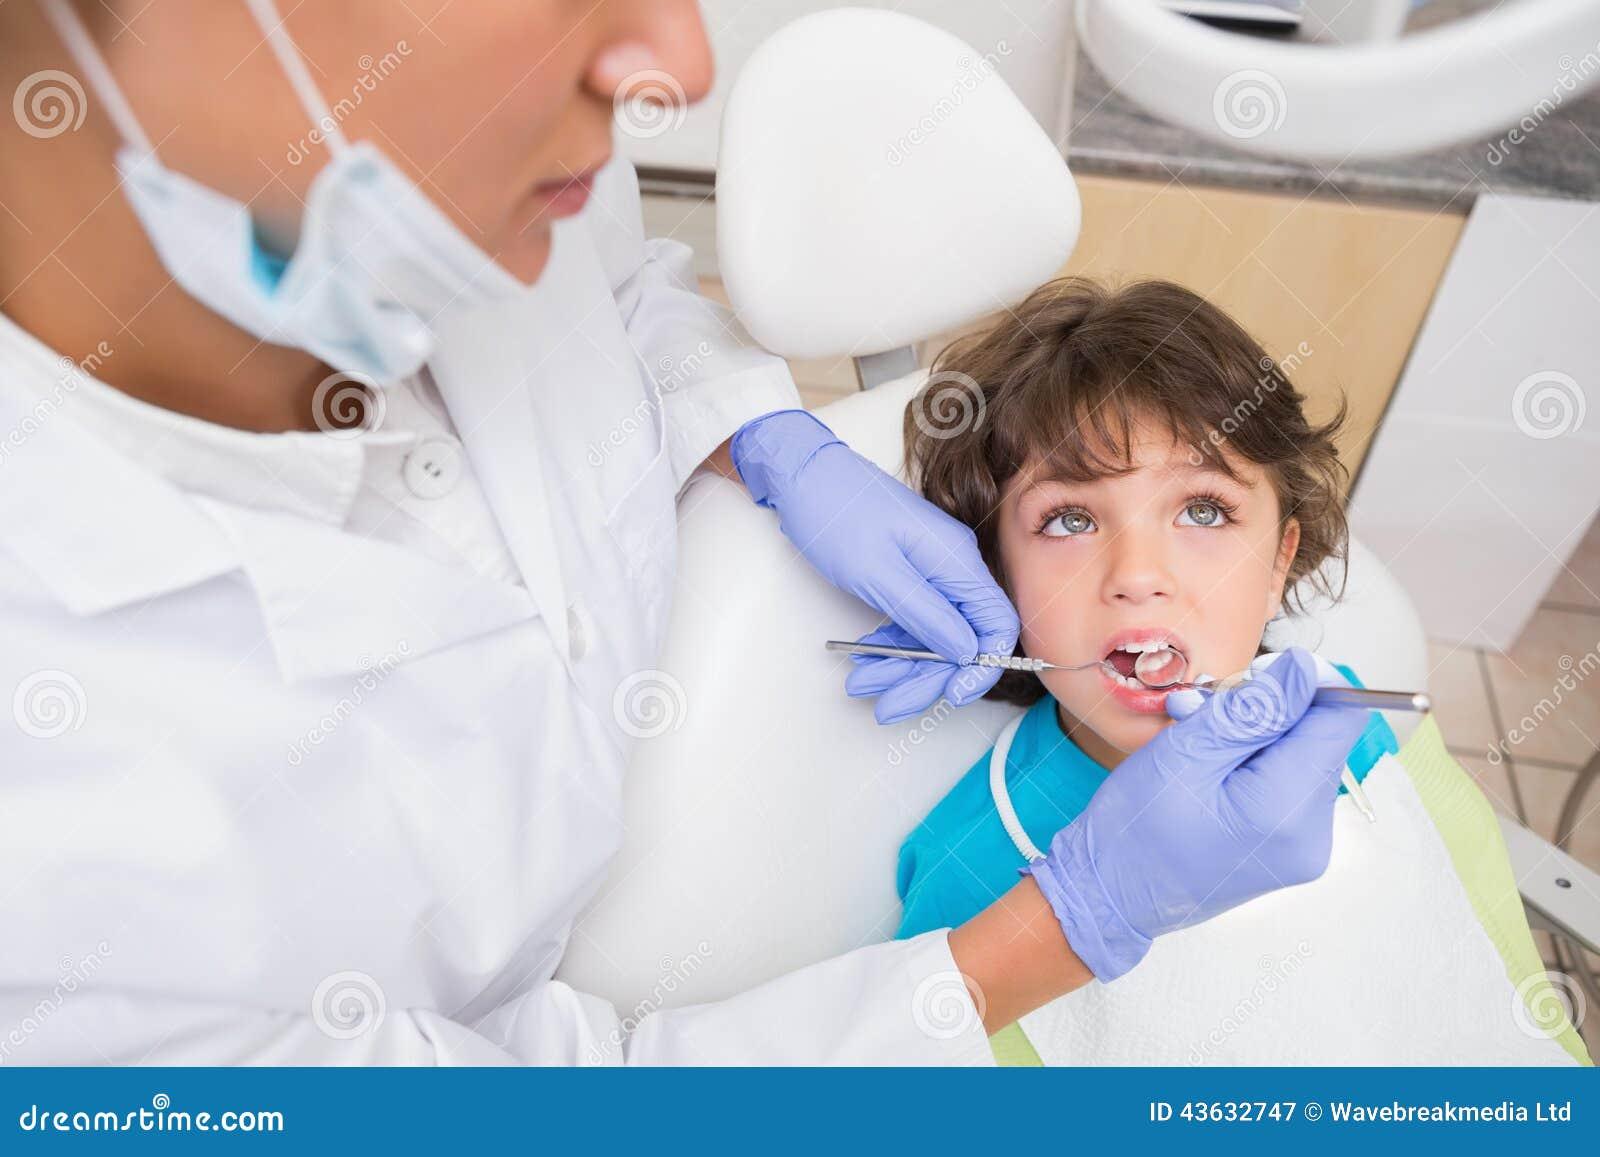 pediatric dental clinic business plan